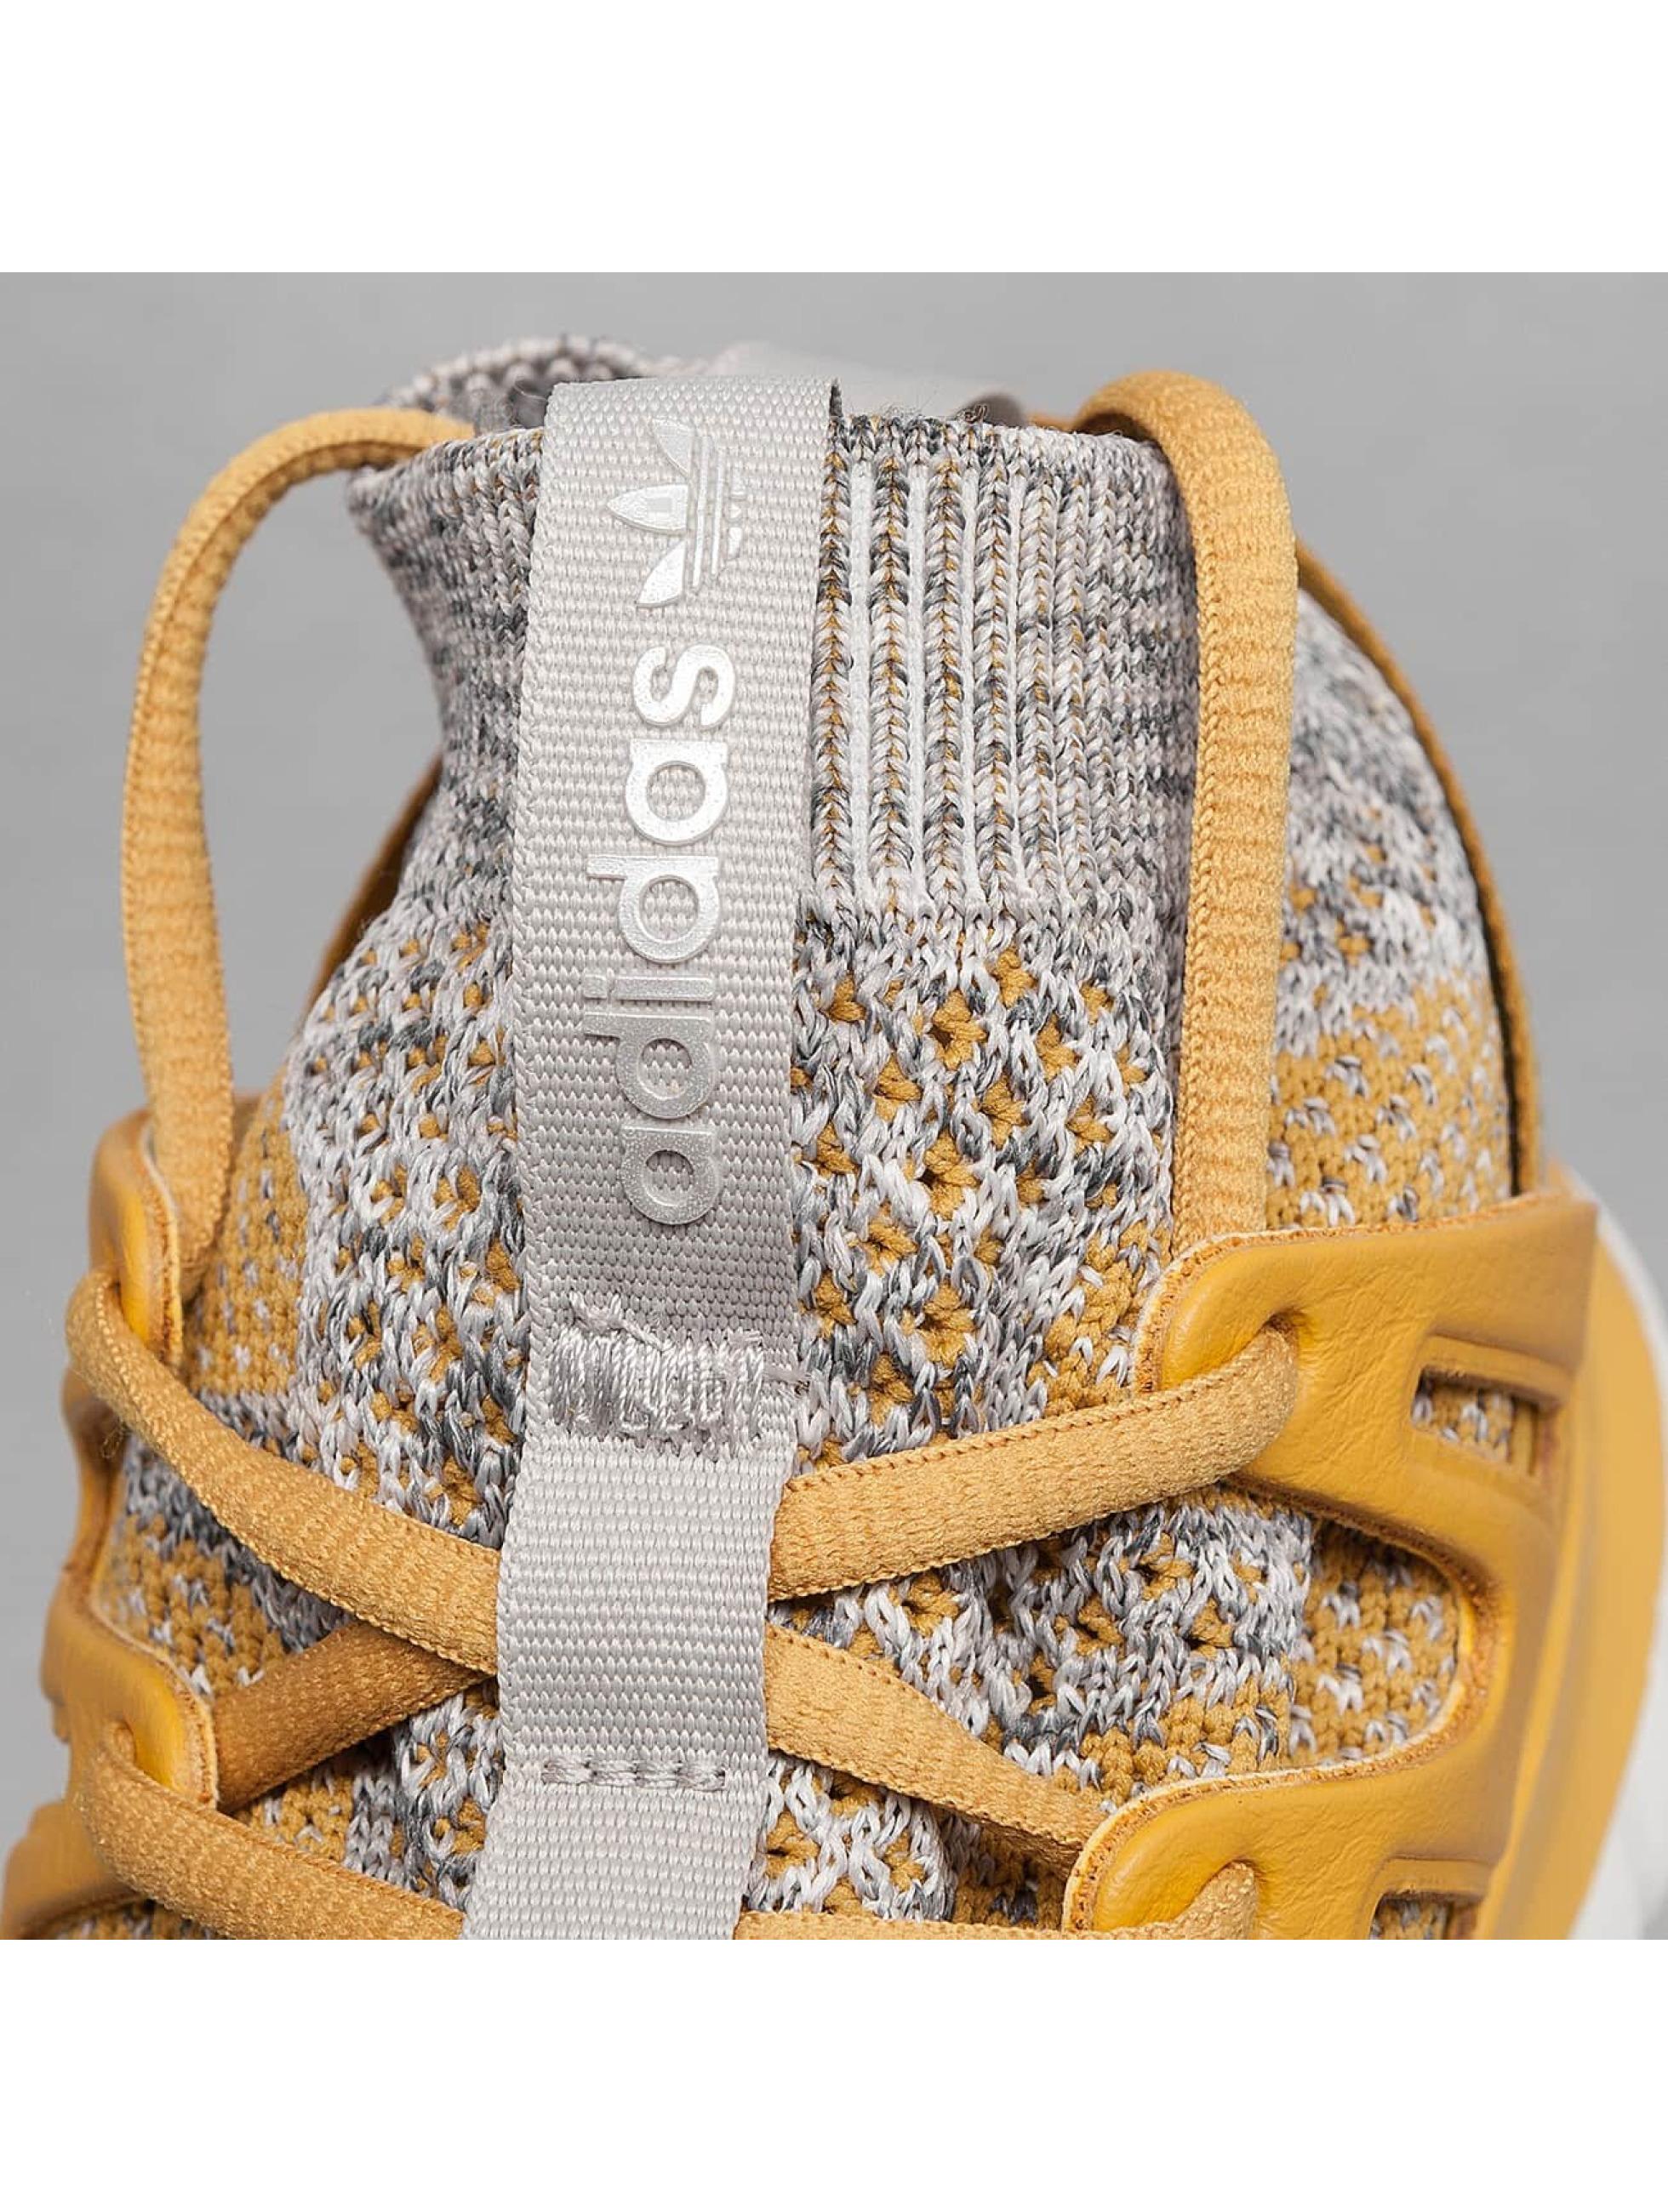 adidas Sneakers Tubular Nova PK yellow